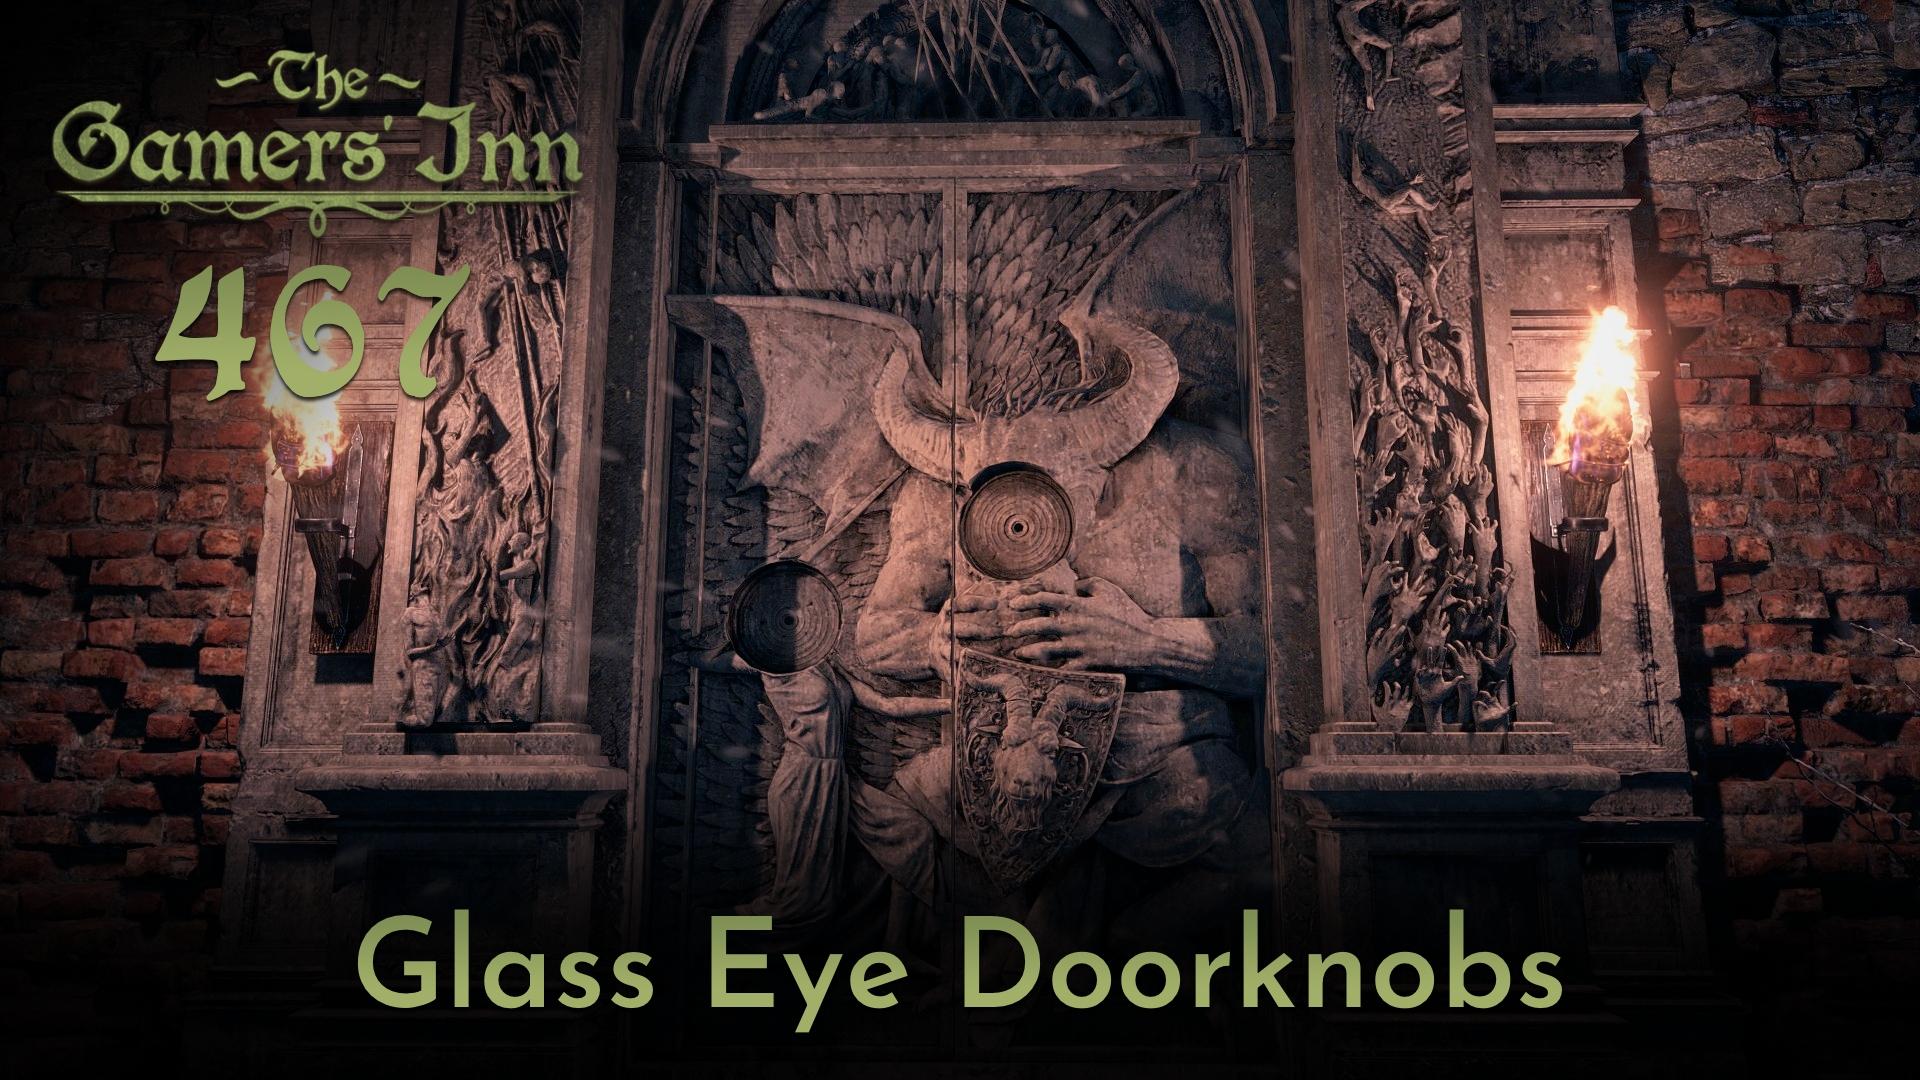 TGI 467 – Glass Eye Doorknobs